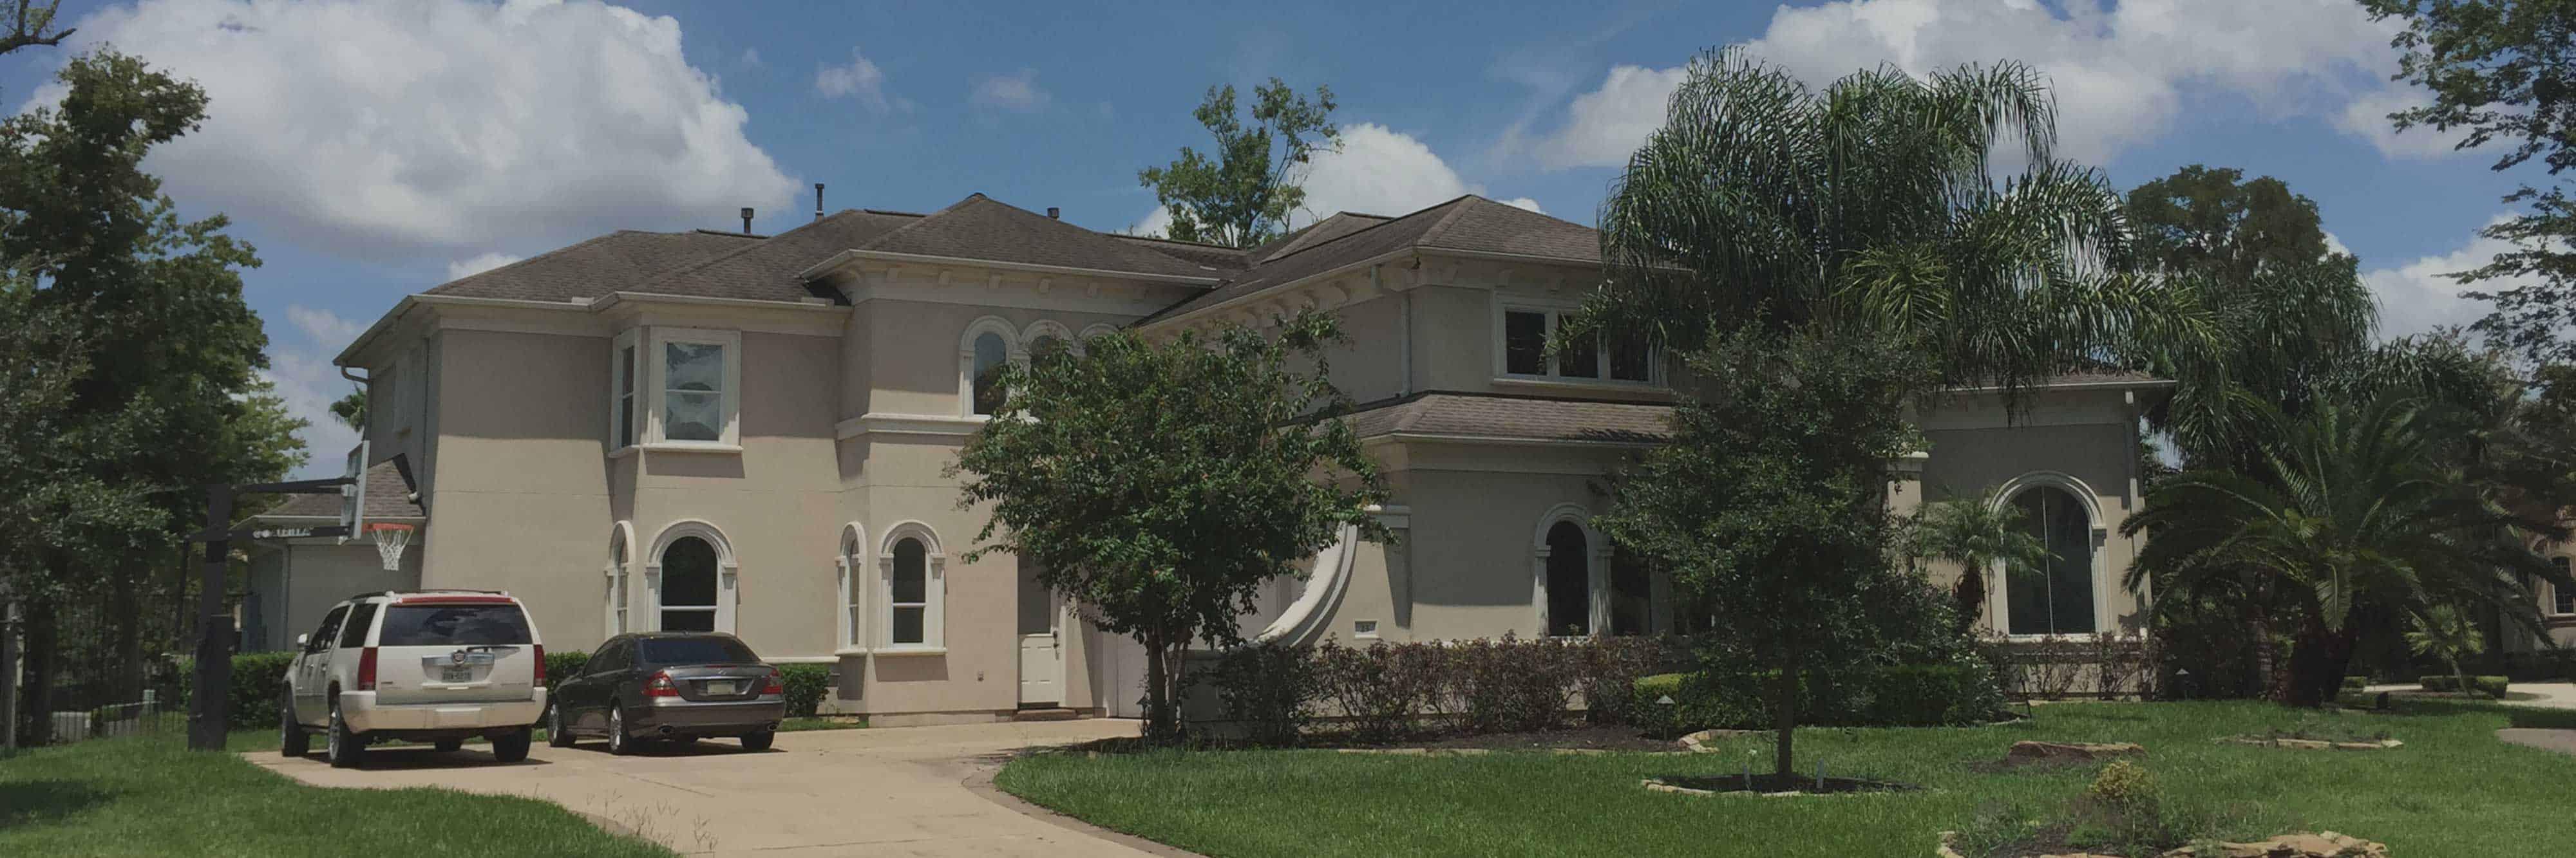 Residential - image residential on https://skylightwindowfilms.com